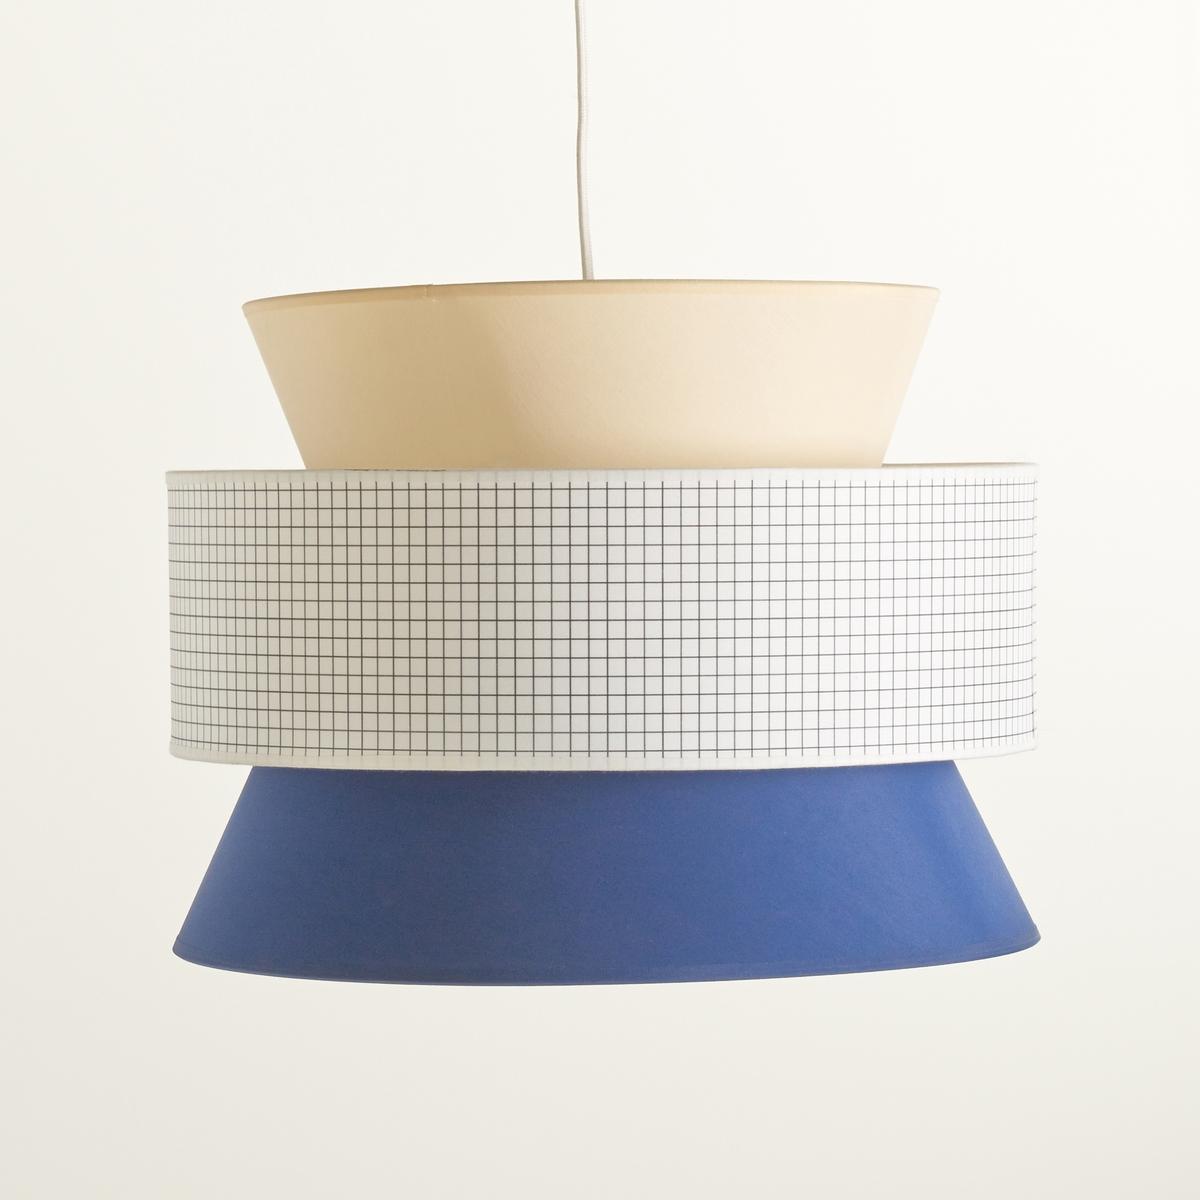 Лампа с 3 абажурами, Dolkie